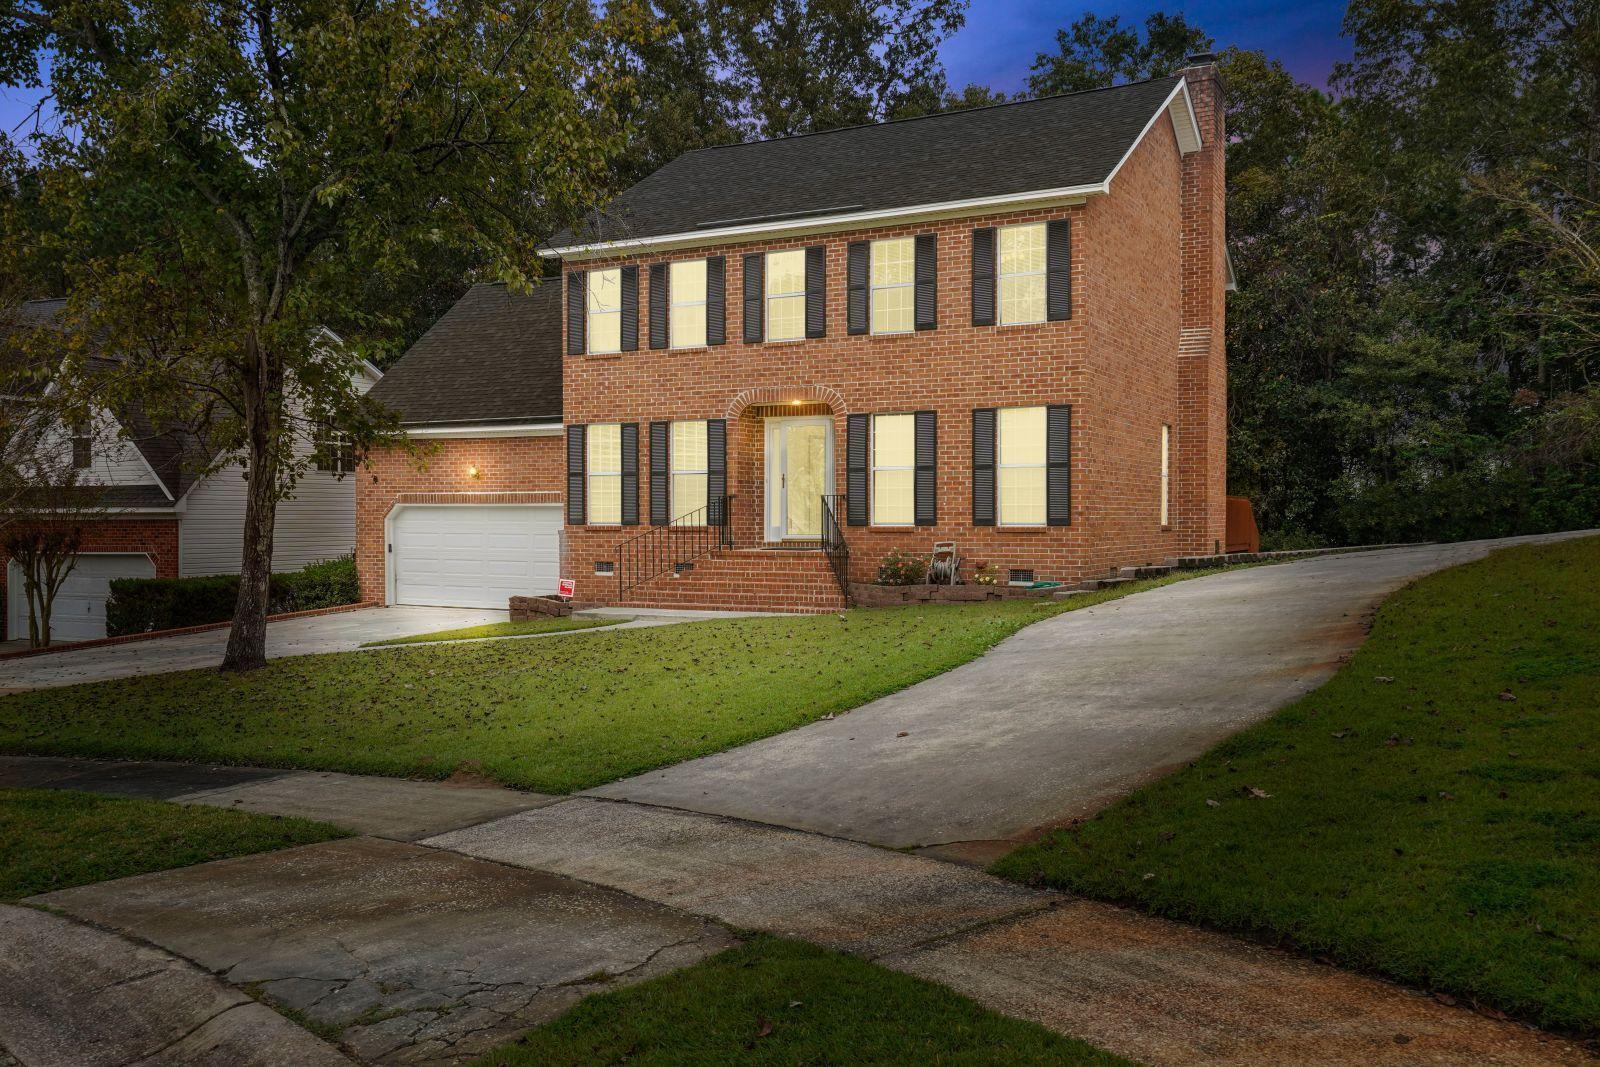 Crowfield Plantation Homes For Sale - 161 Belleplaine, Goose Creek, SC - 2